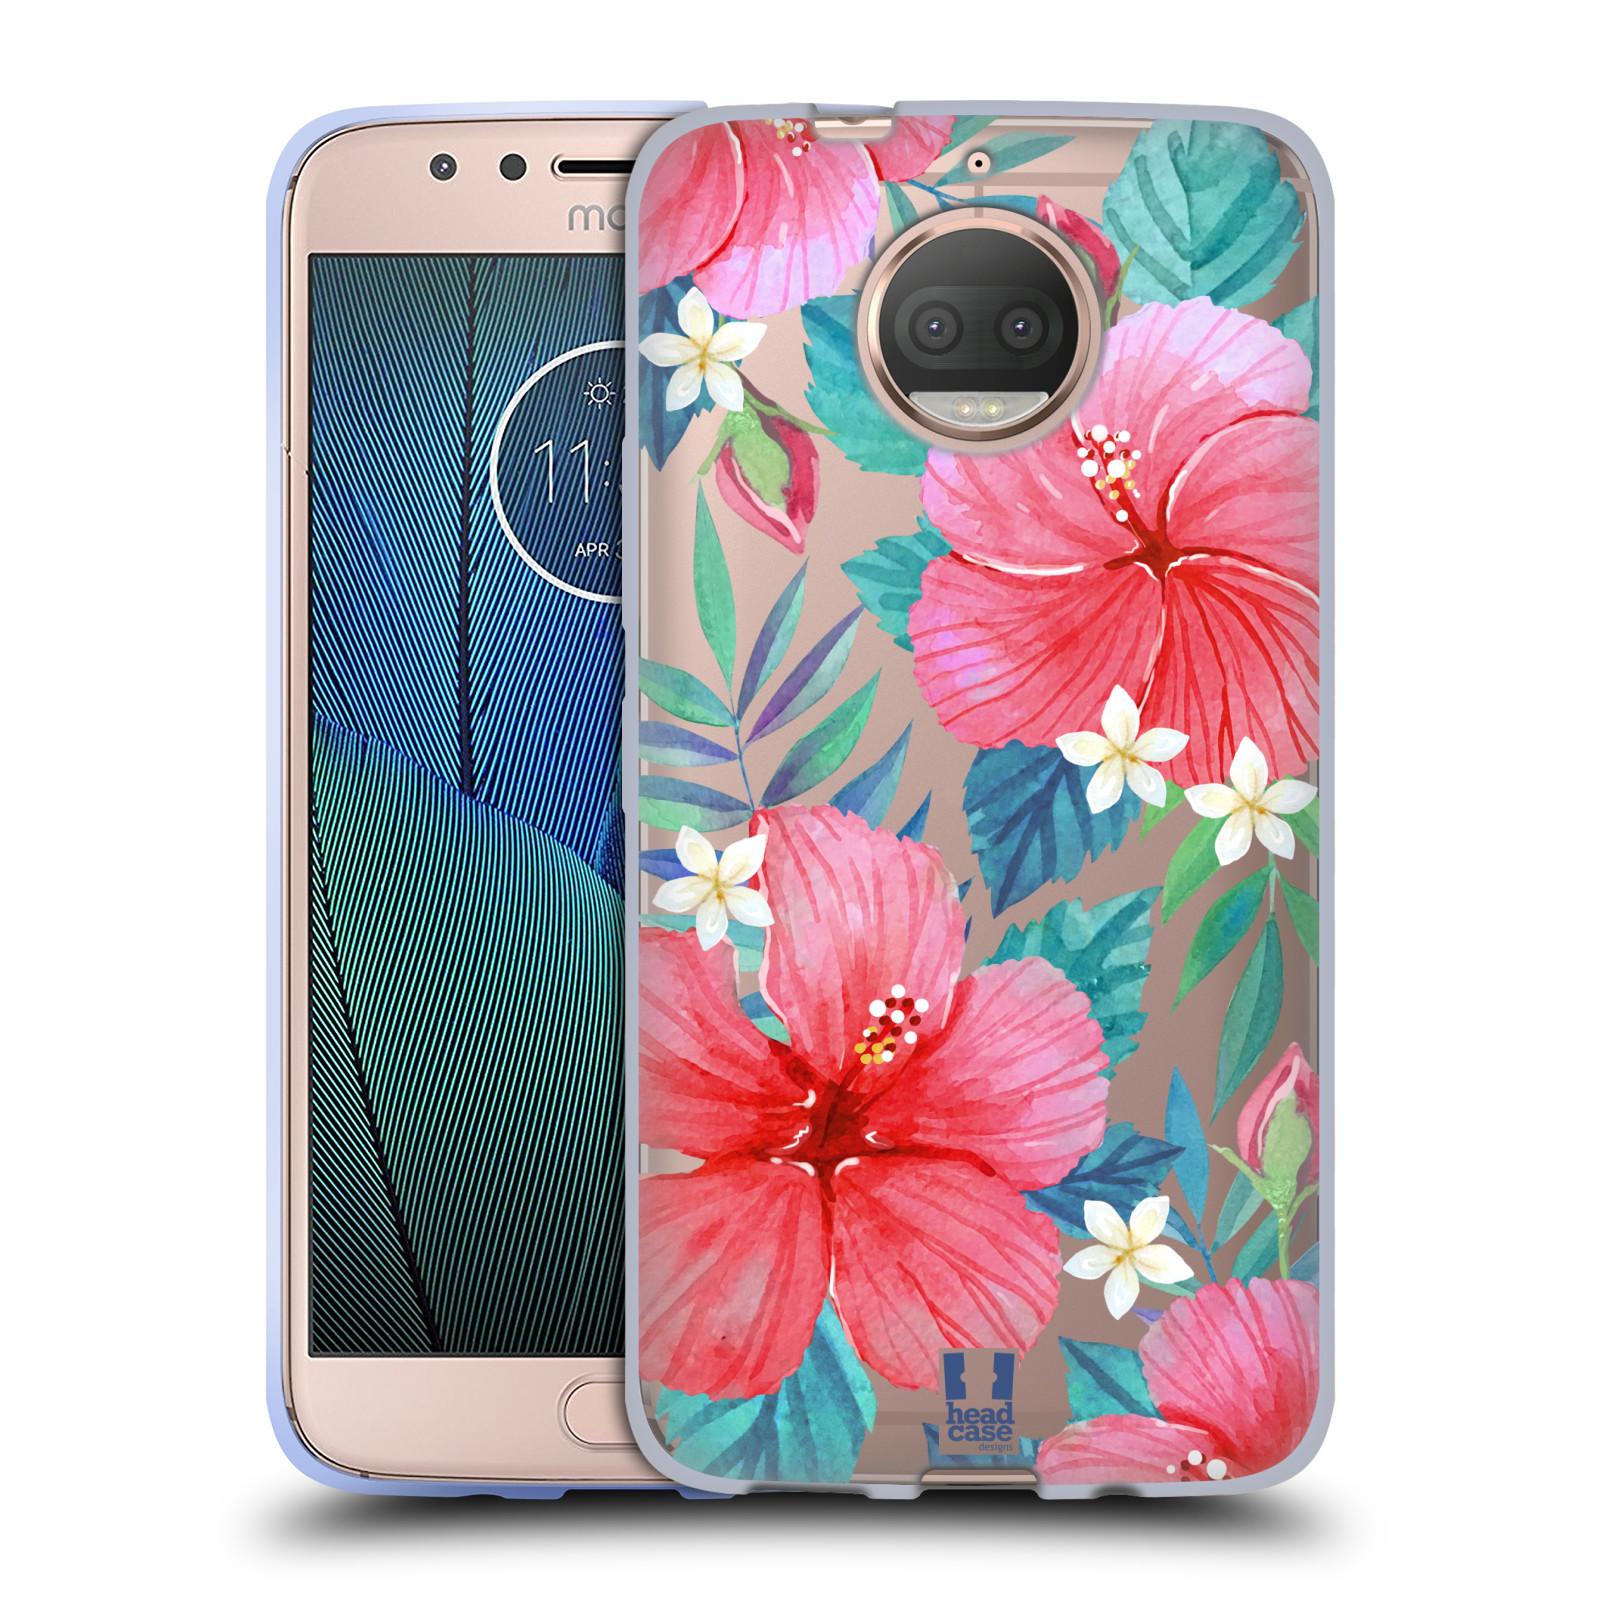 HEAD CASE silikonový obal na mobil Lenovo Moto G5s PLUS květinové vzory Ibišek čínská růže